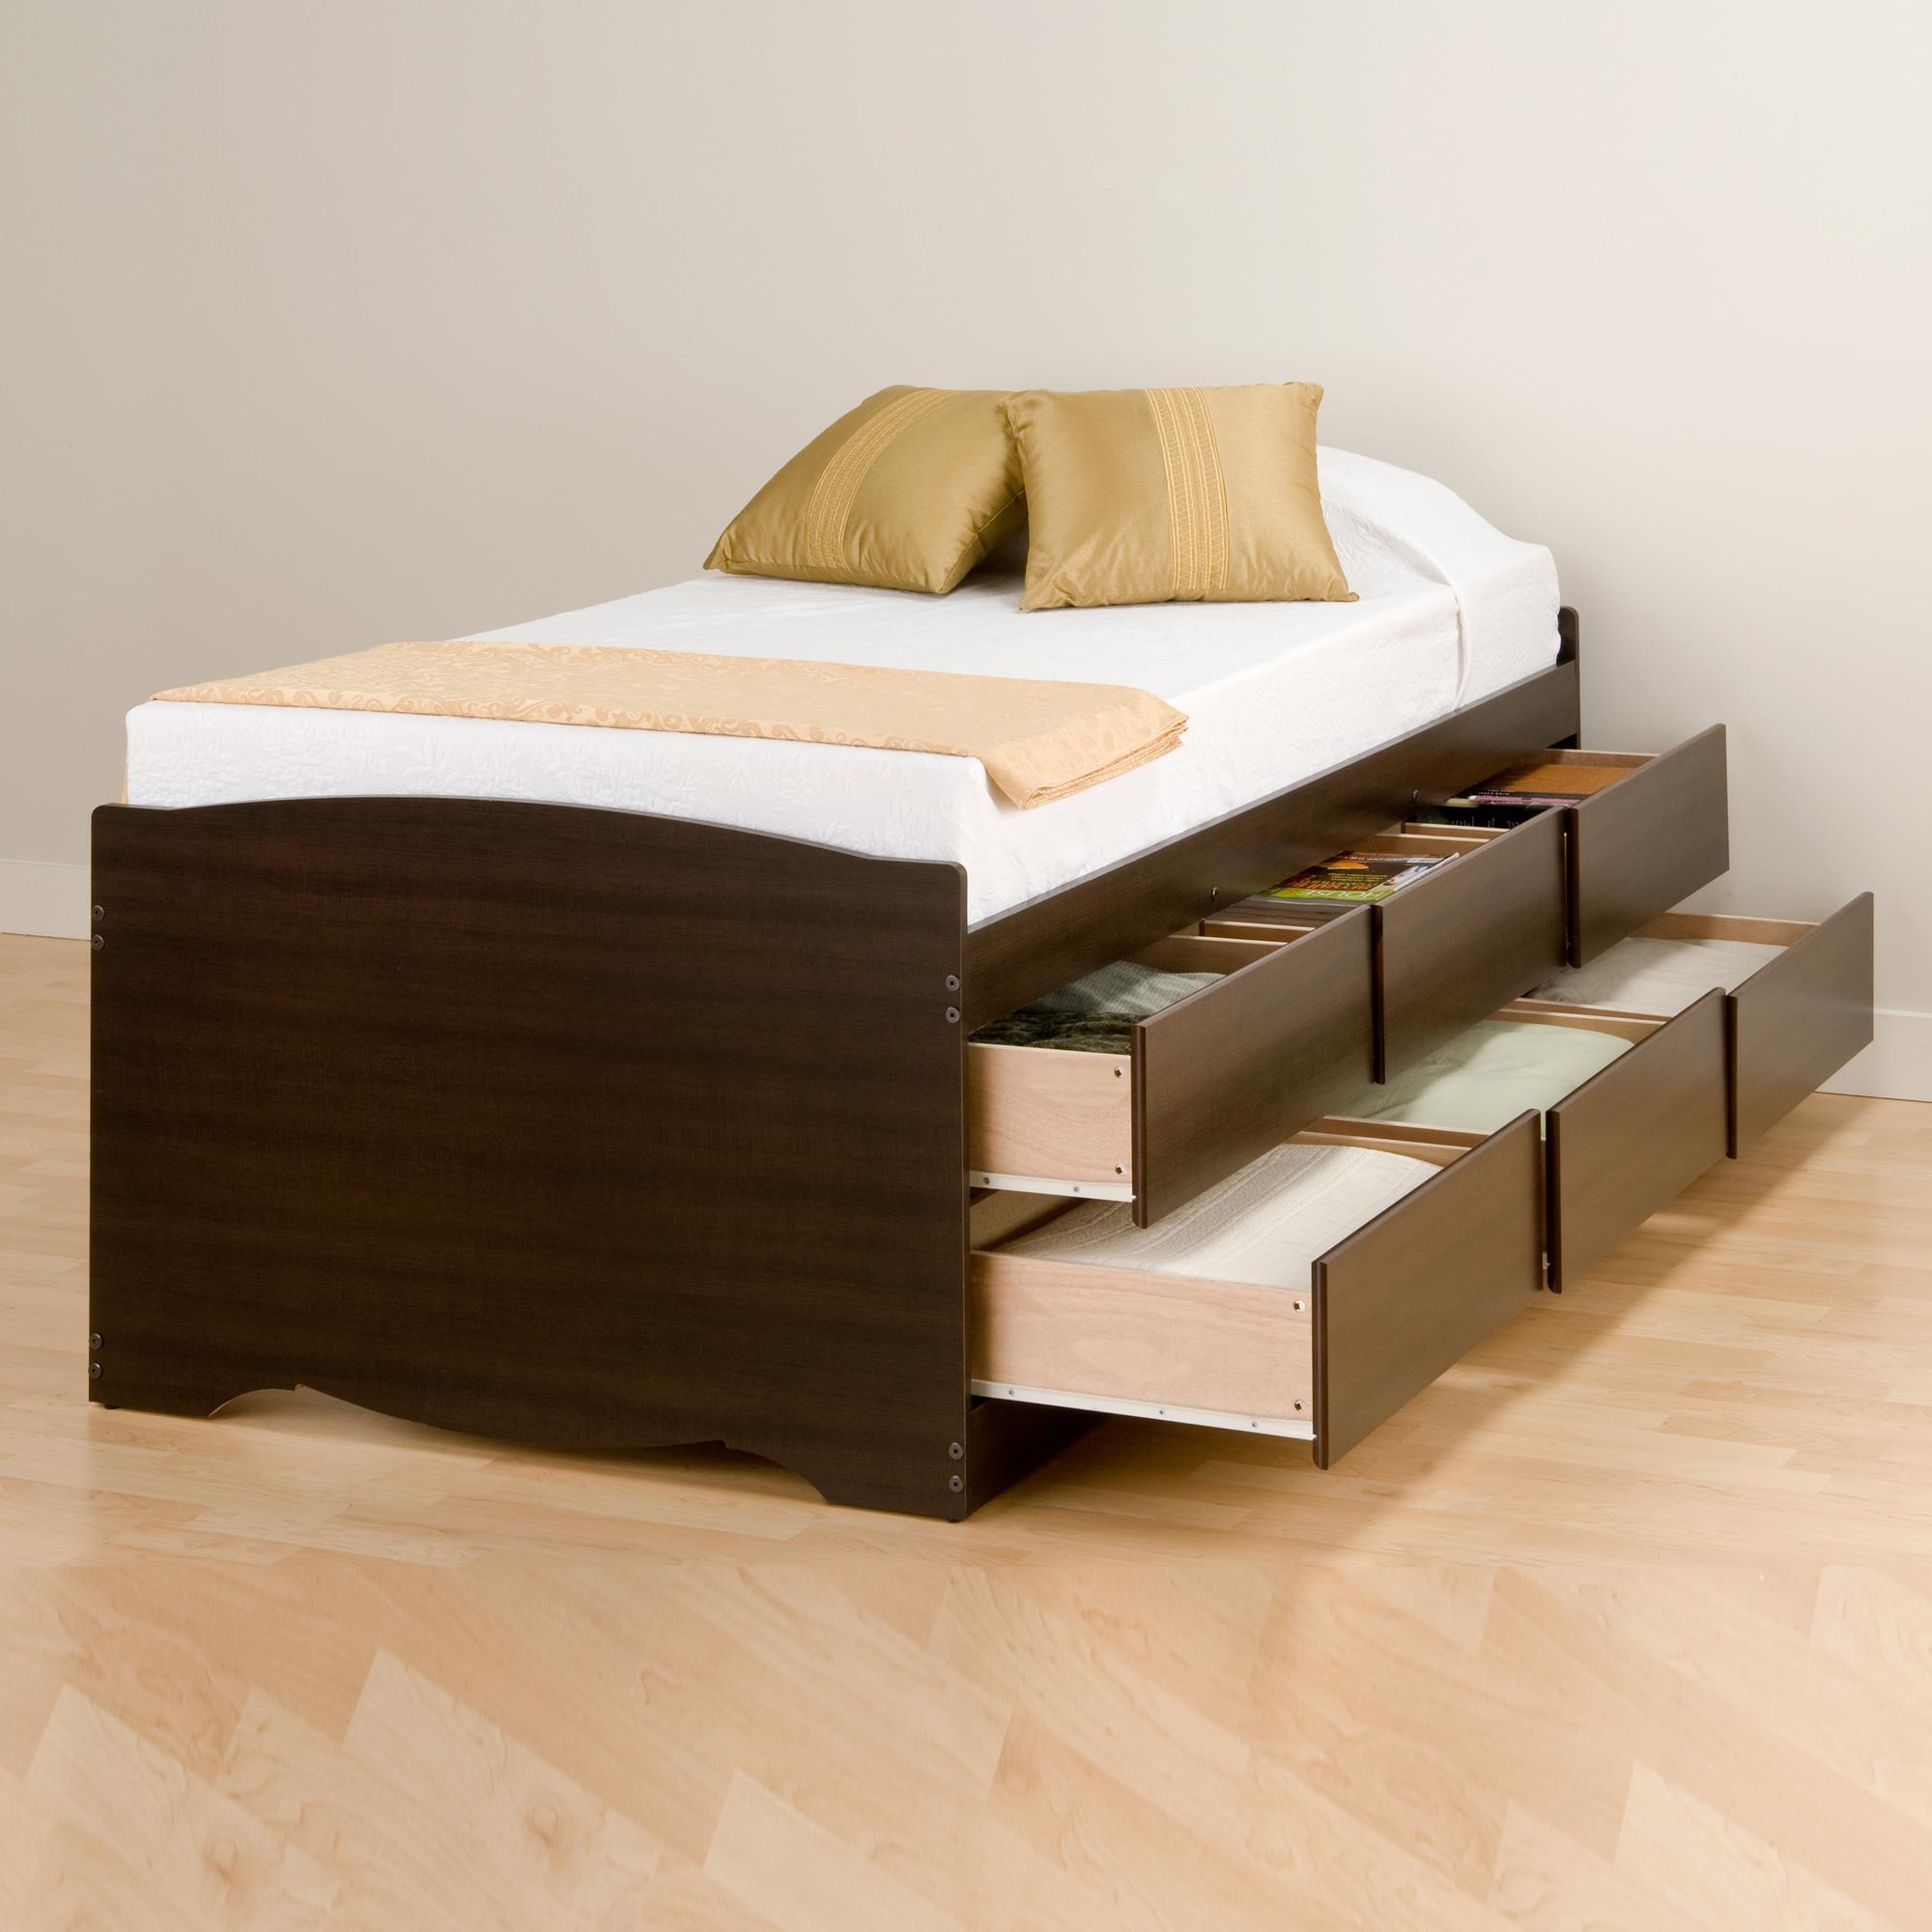 Prepac Twin 6 Drawer Tall Platform Storage Bed By Oj